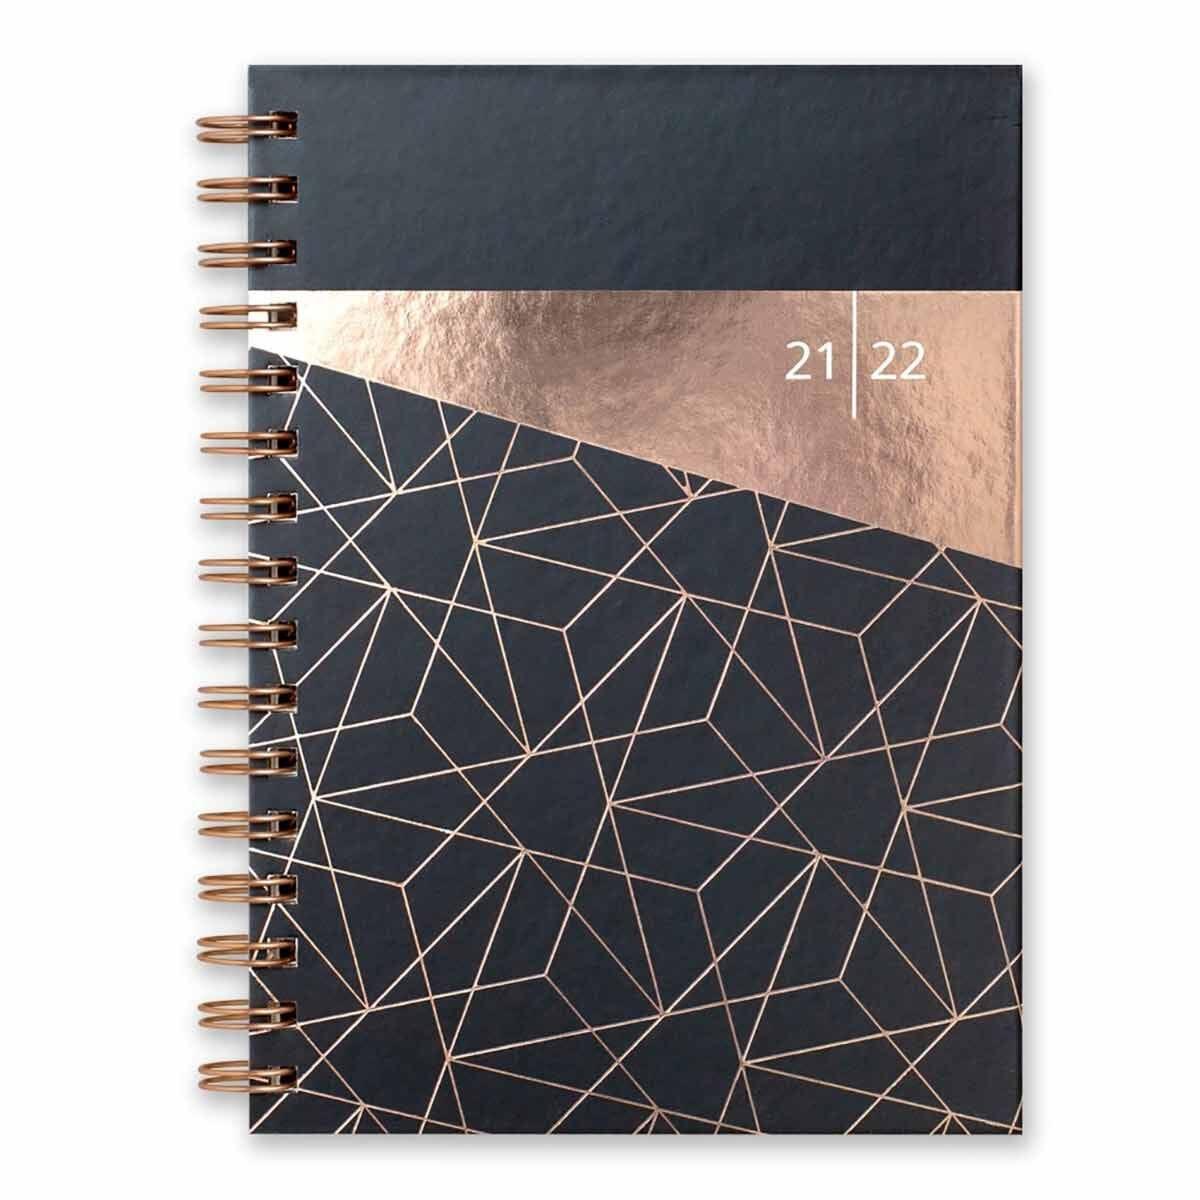 Matilda Myres Academic Diary Week to View A5 2021-2022 Black